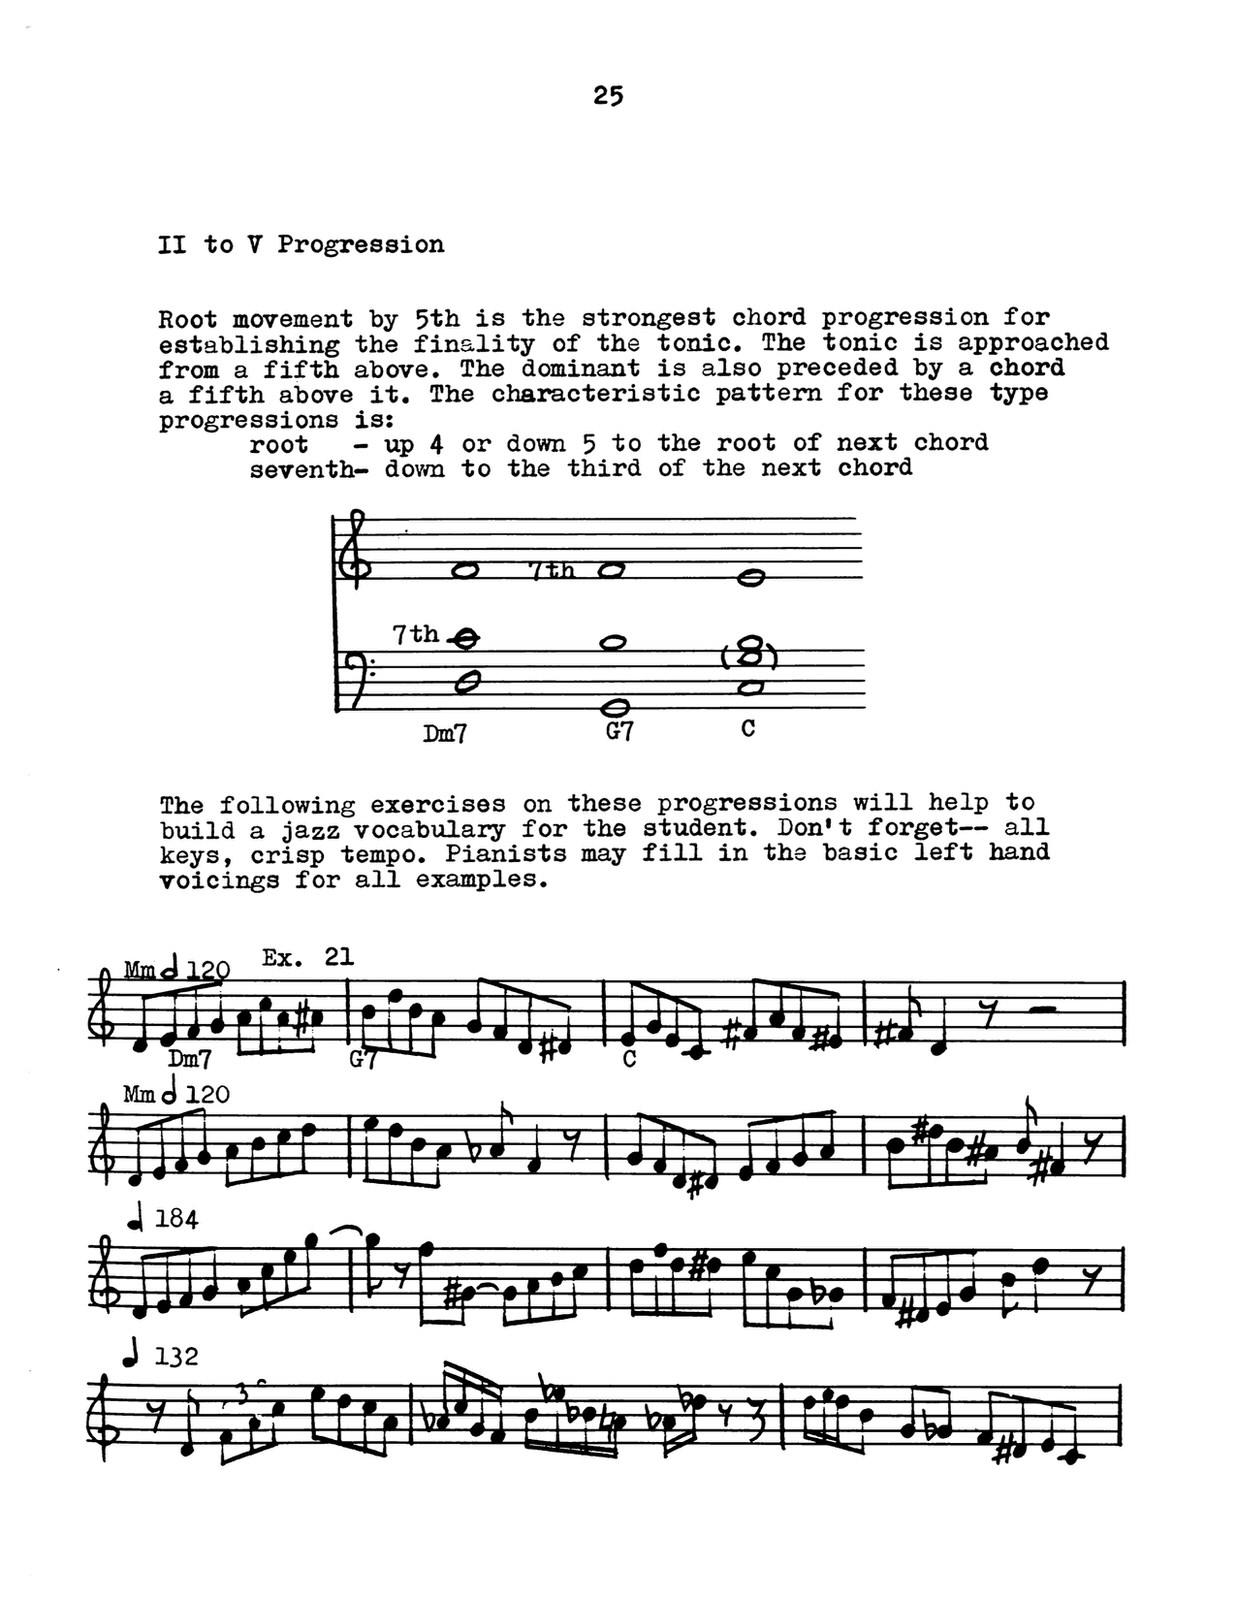 Sandole, Beginner's Method for Jazz Improvisation 6